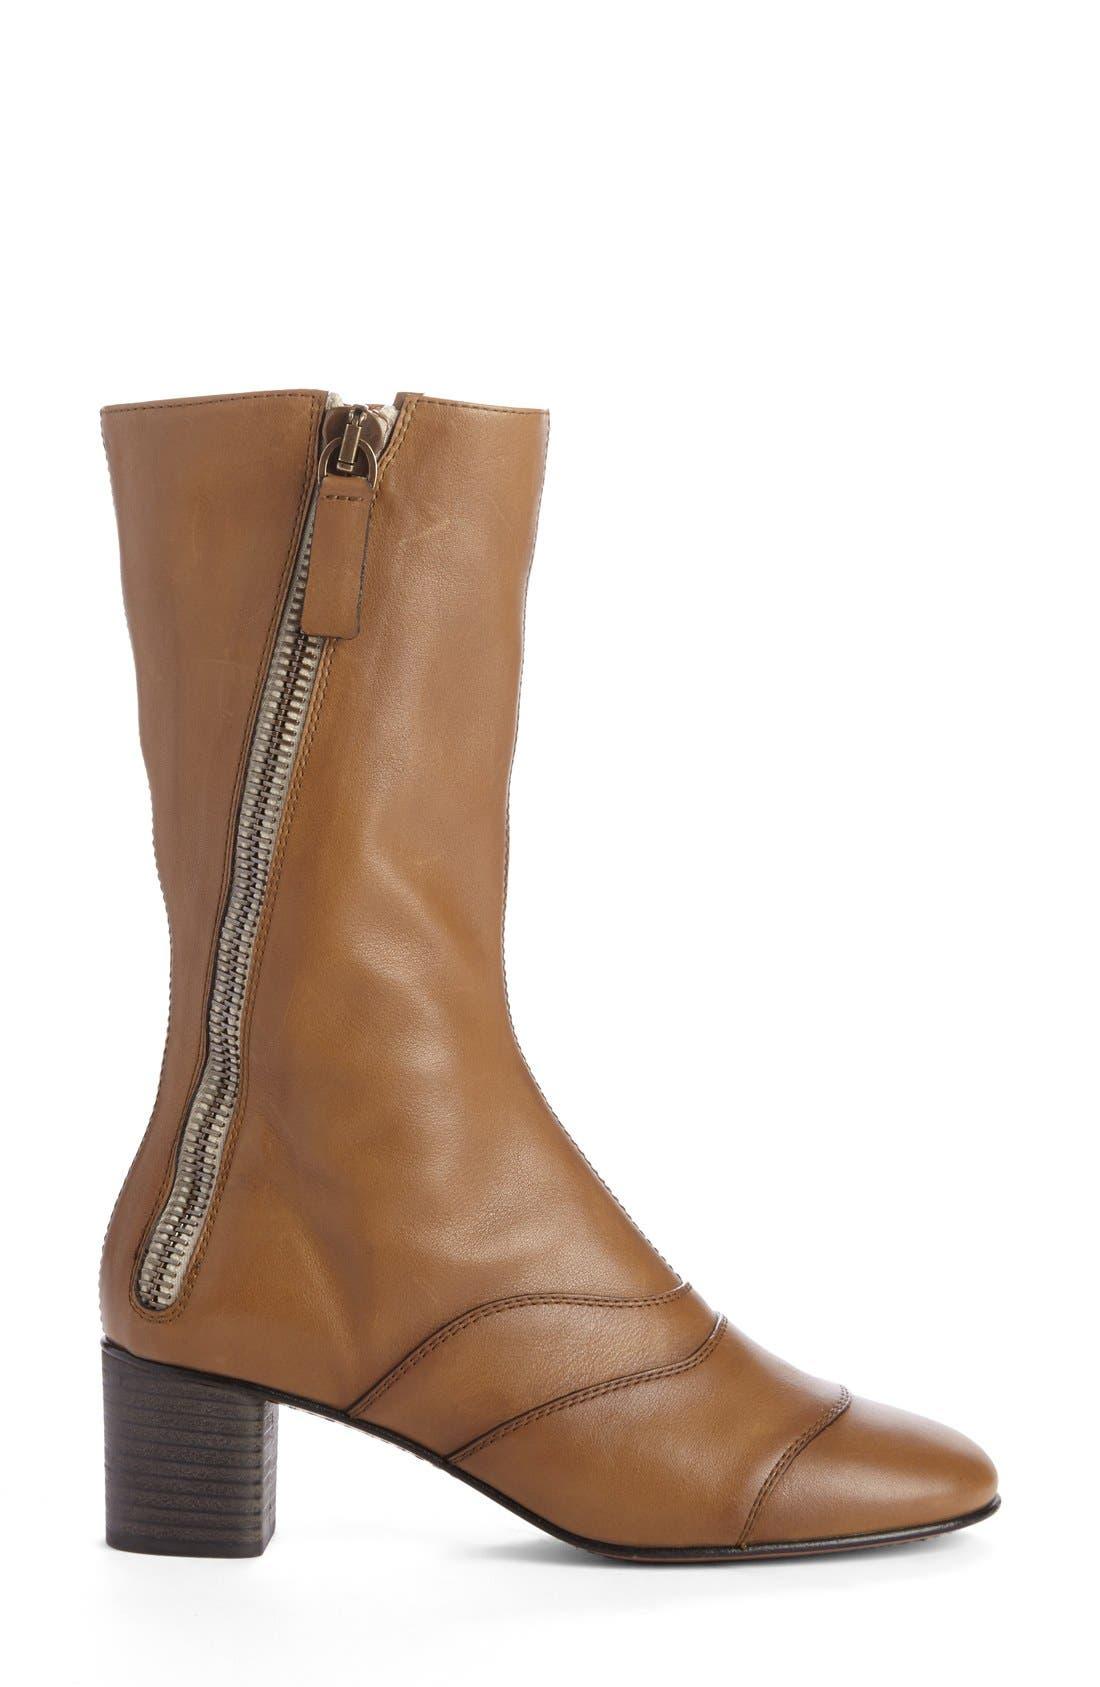 Alternate Image 3  - Chloé 'Lexie' Block Heel Boot (Women)